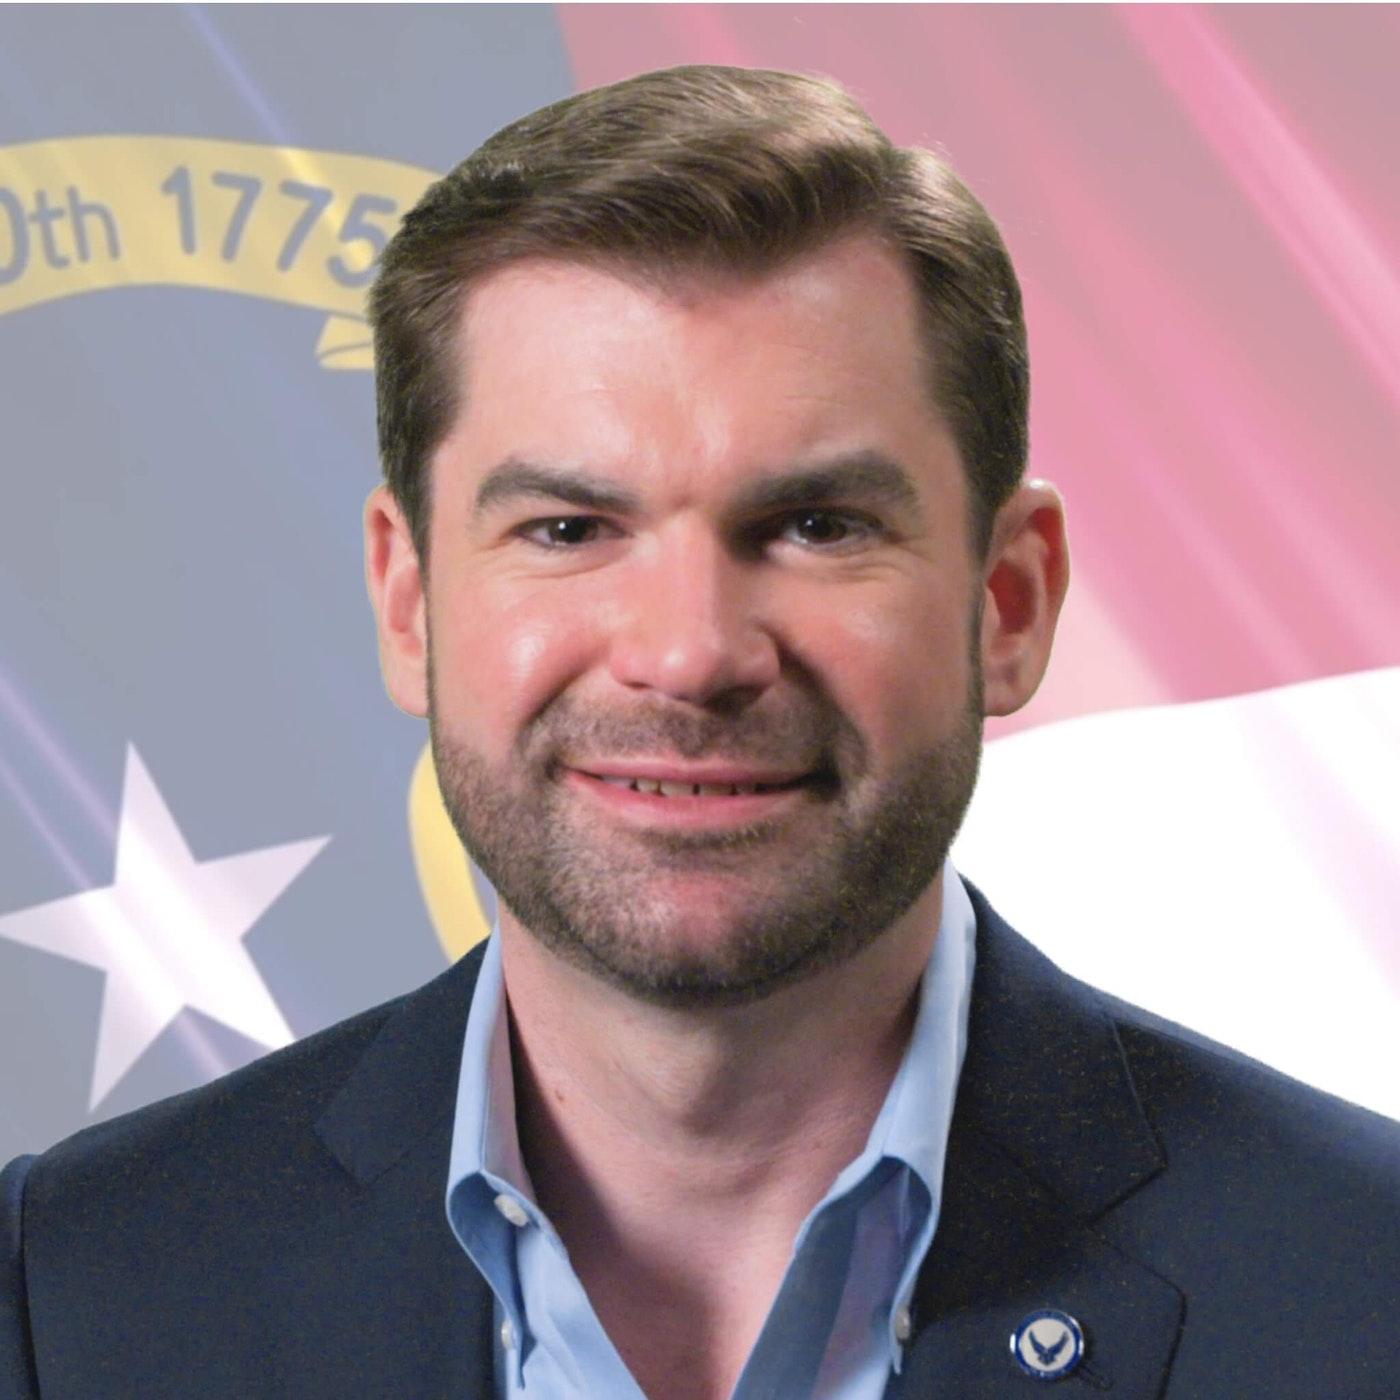 NC Sen. candidate JD Wooten.